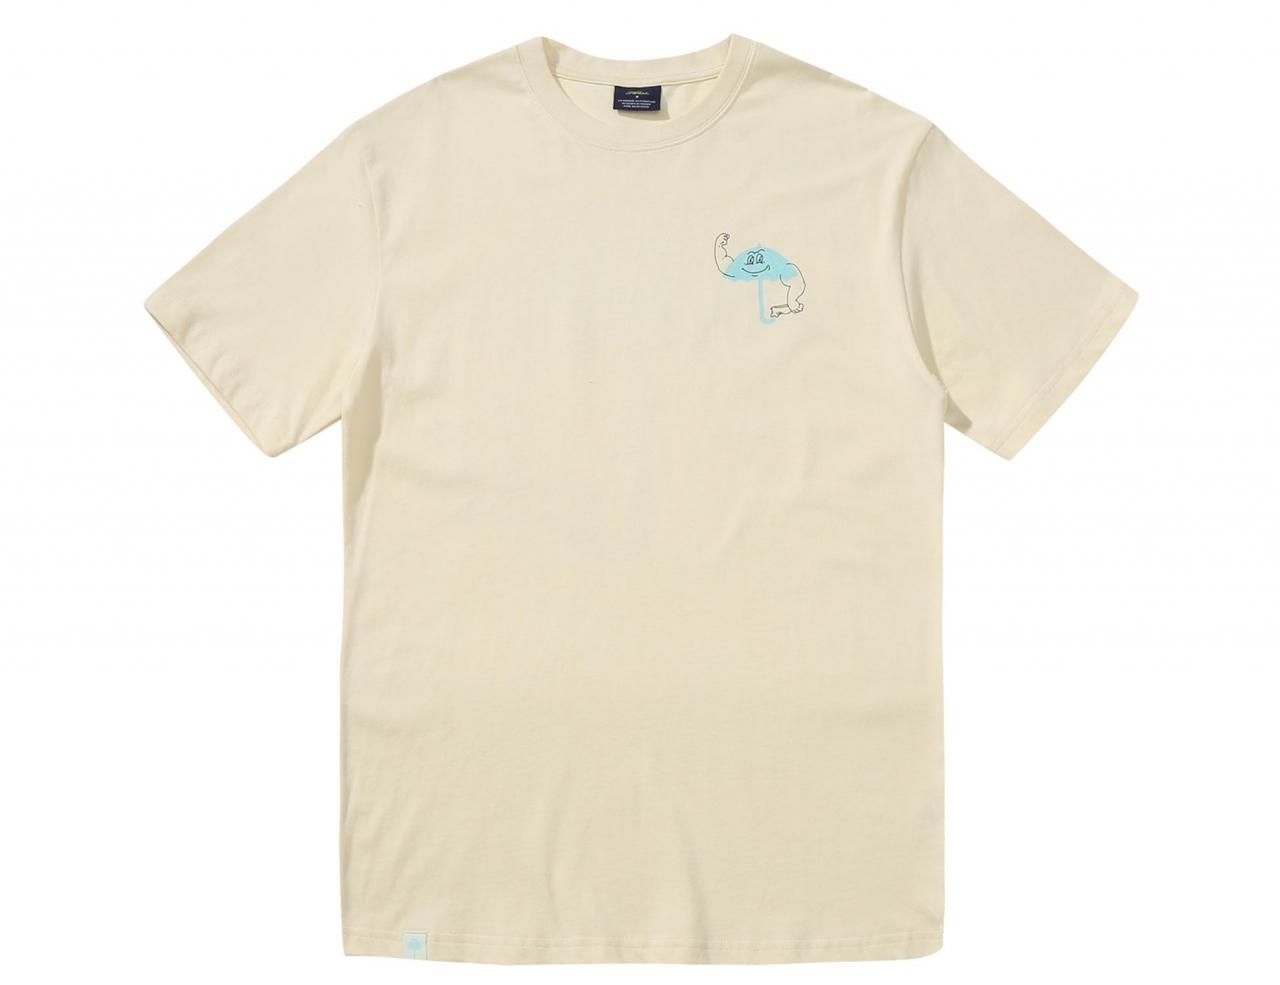 Helas Caps Strong Shirt - Pastel Yellow